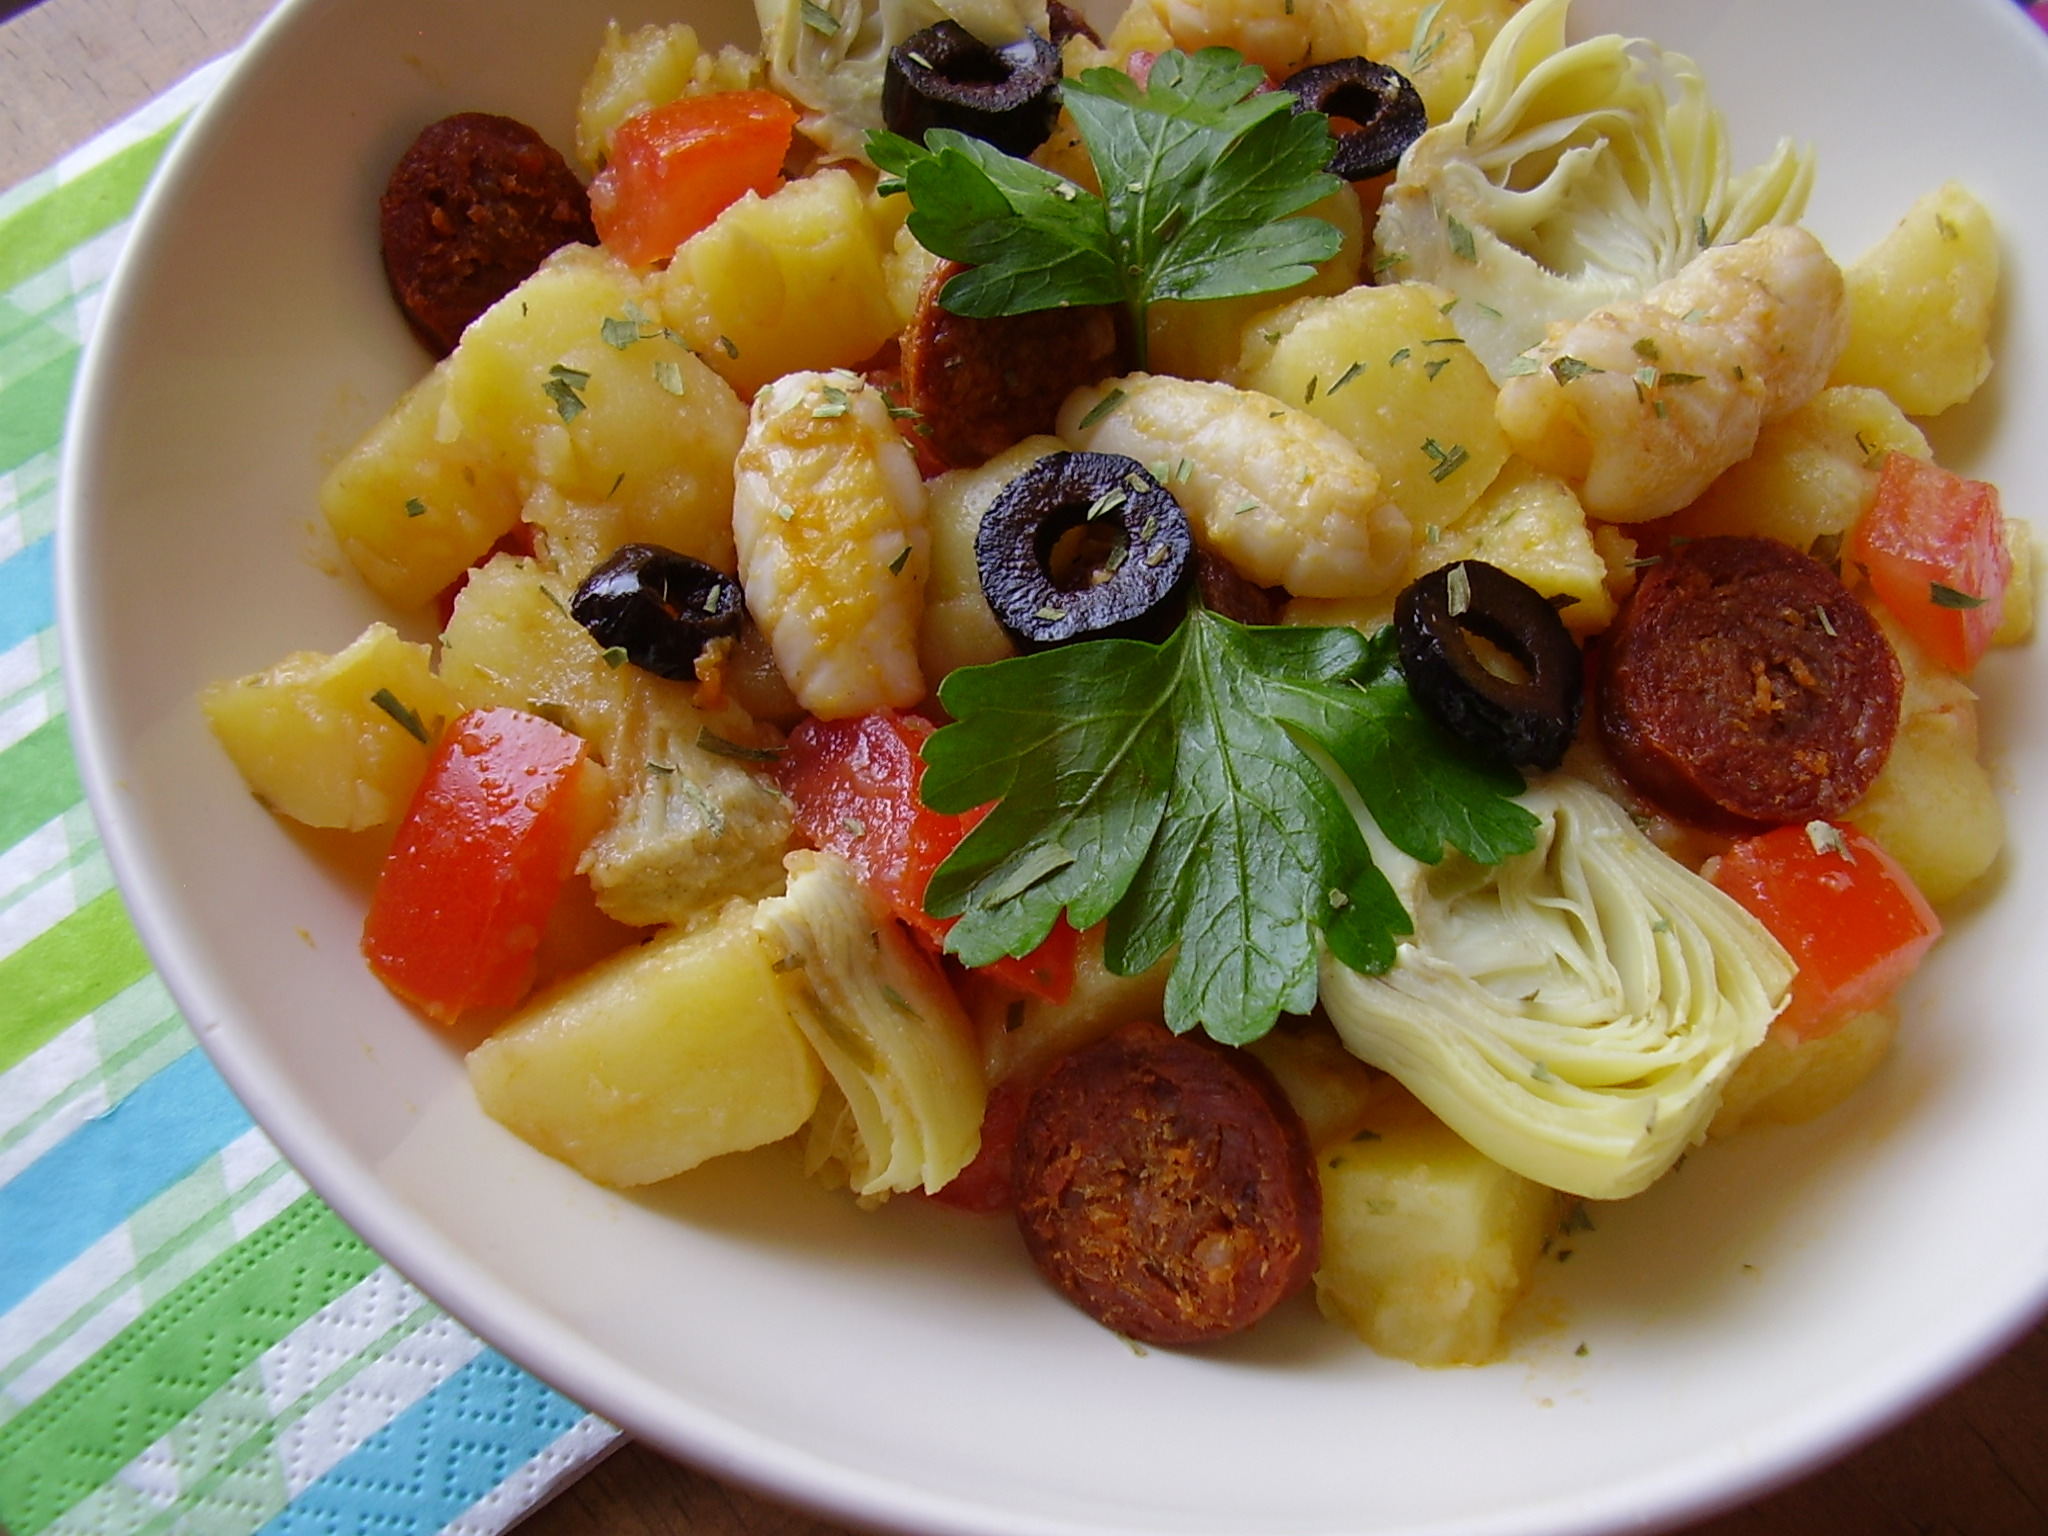 Salade piémontaise revisitée (calamar, chorizo et artichaut)